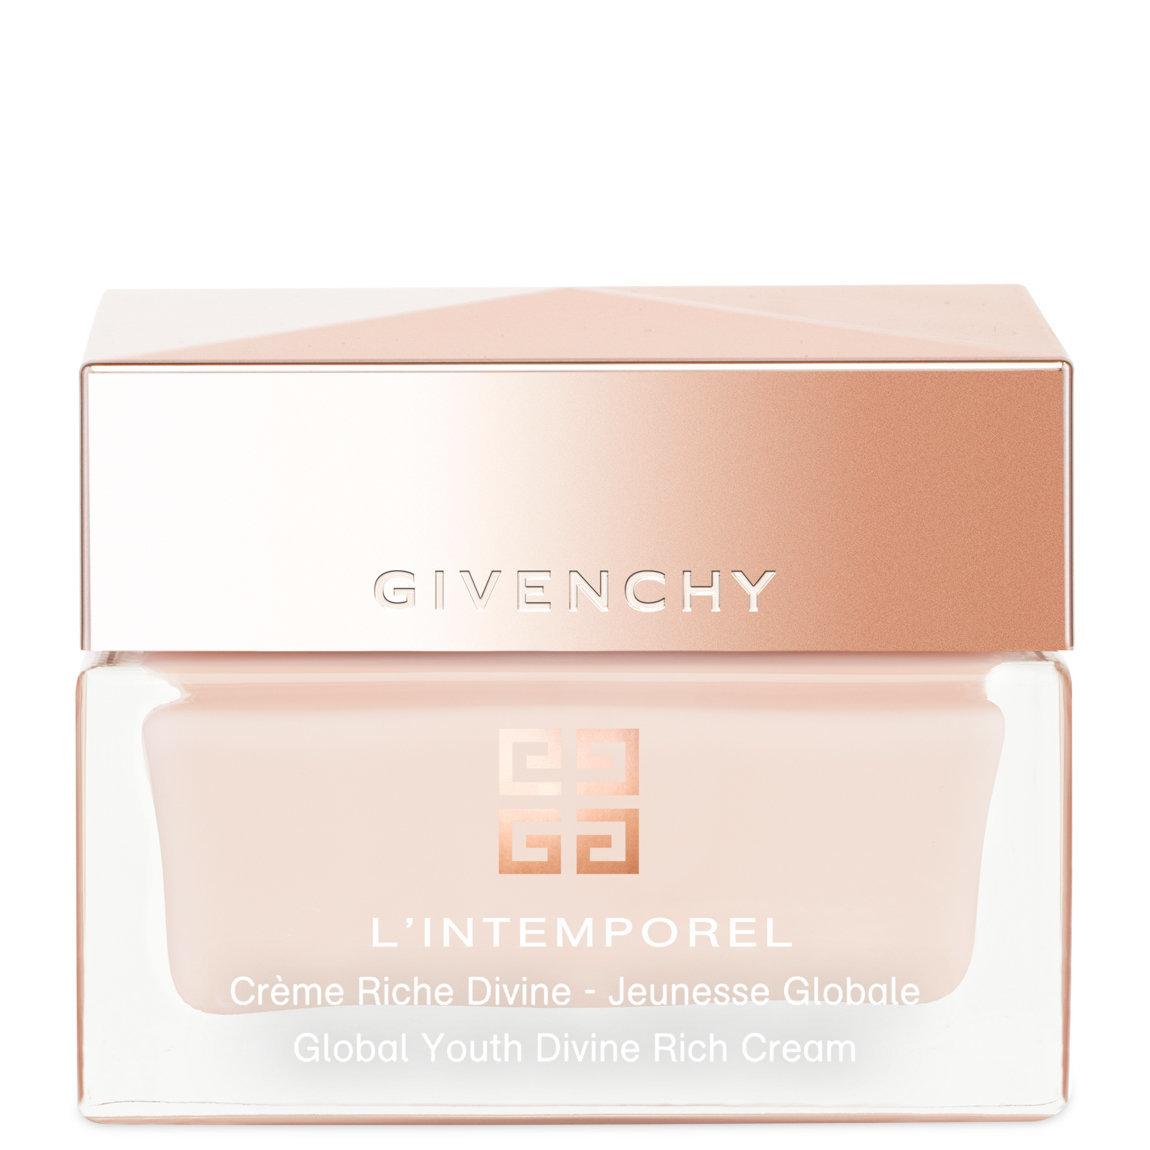 Givenchy L'Intemporel Divine Rich Cream alternative view 1 - product swatch.